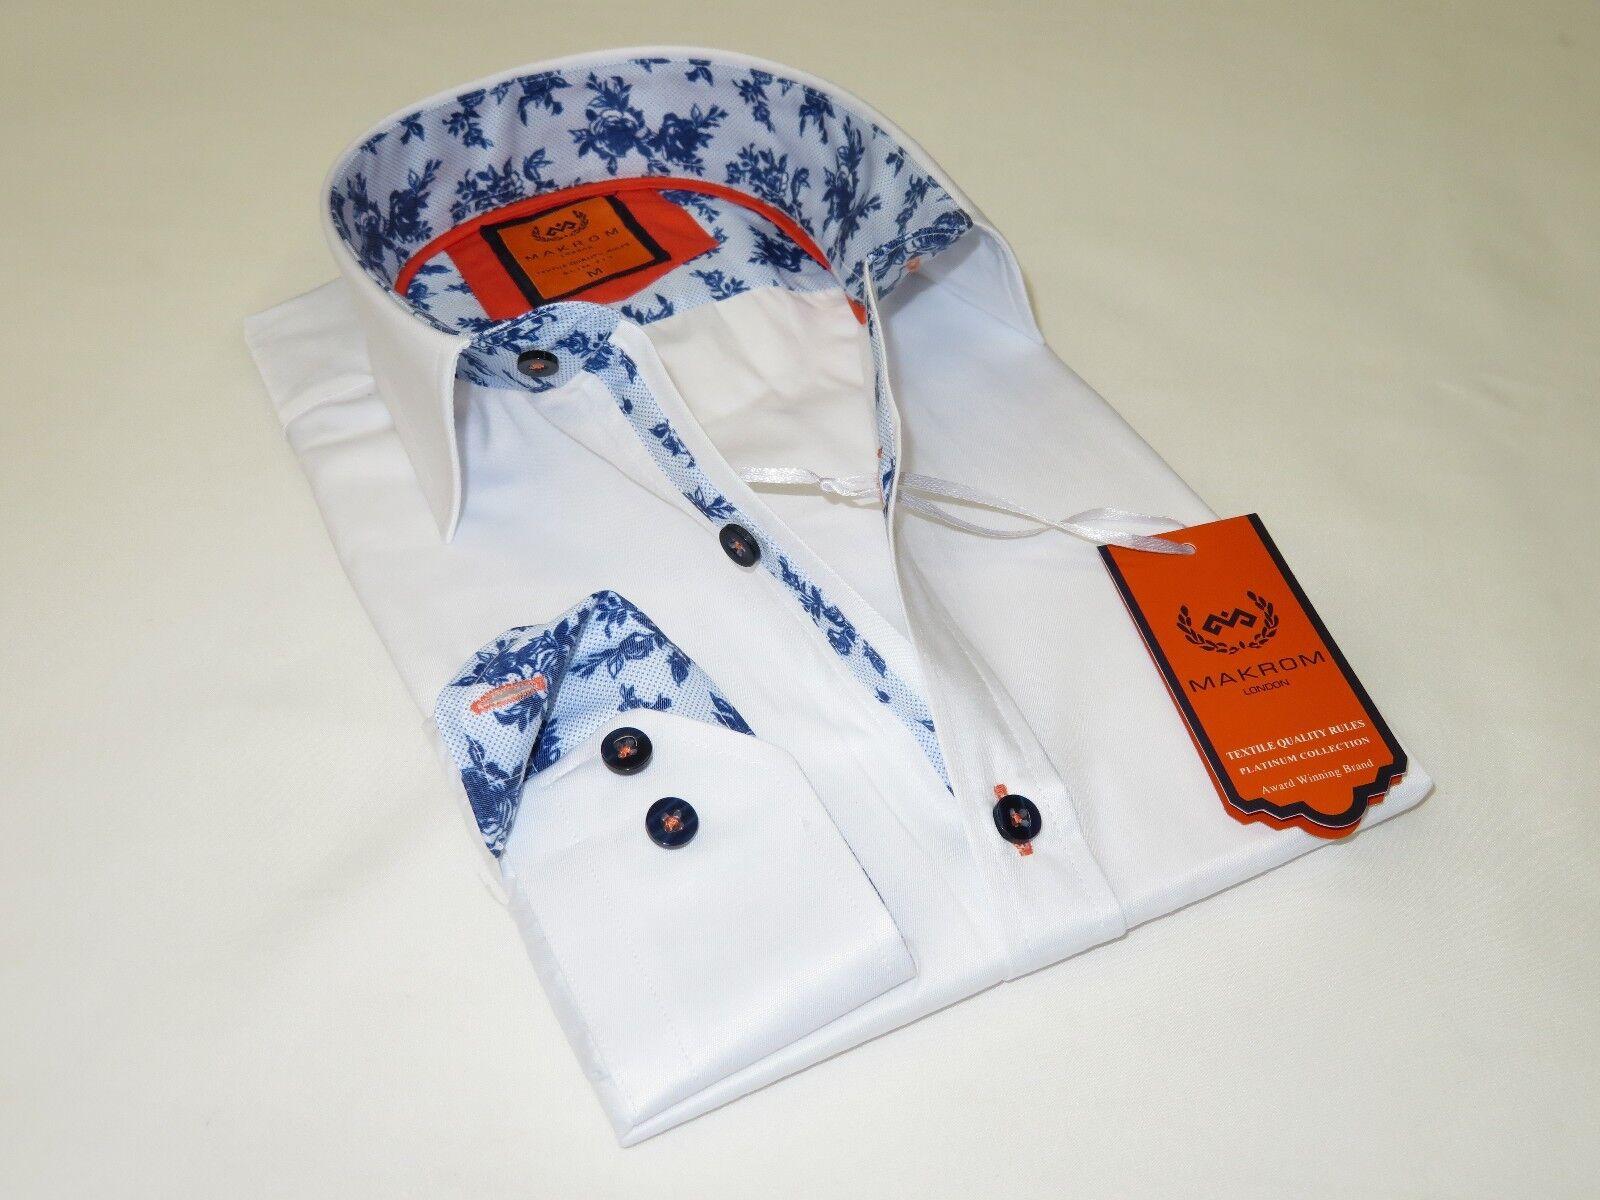 Men MAKROM LONDON Shirt Cotton Blend Wrinkle less Turkey 6283-434 White Floral